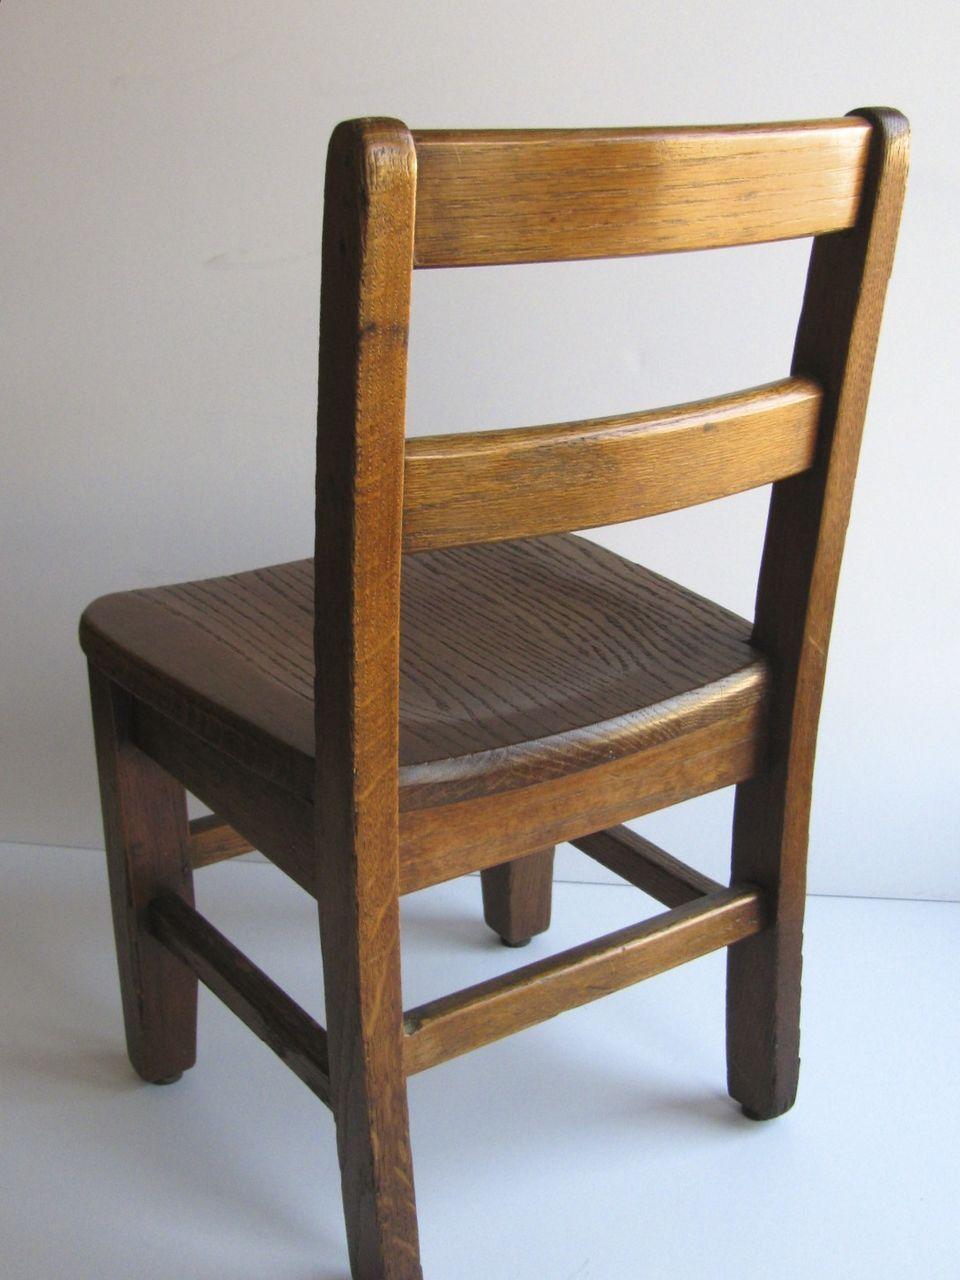 Vintage Oak Childs School Chair Sturdy from blacktulip on